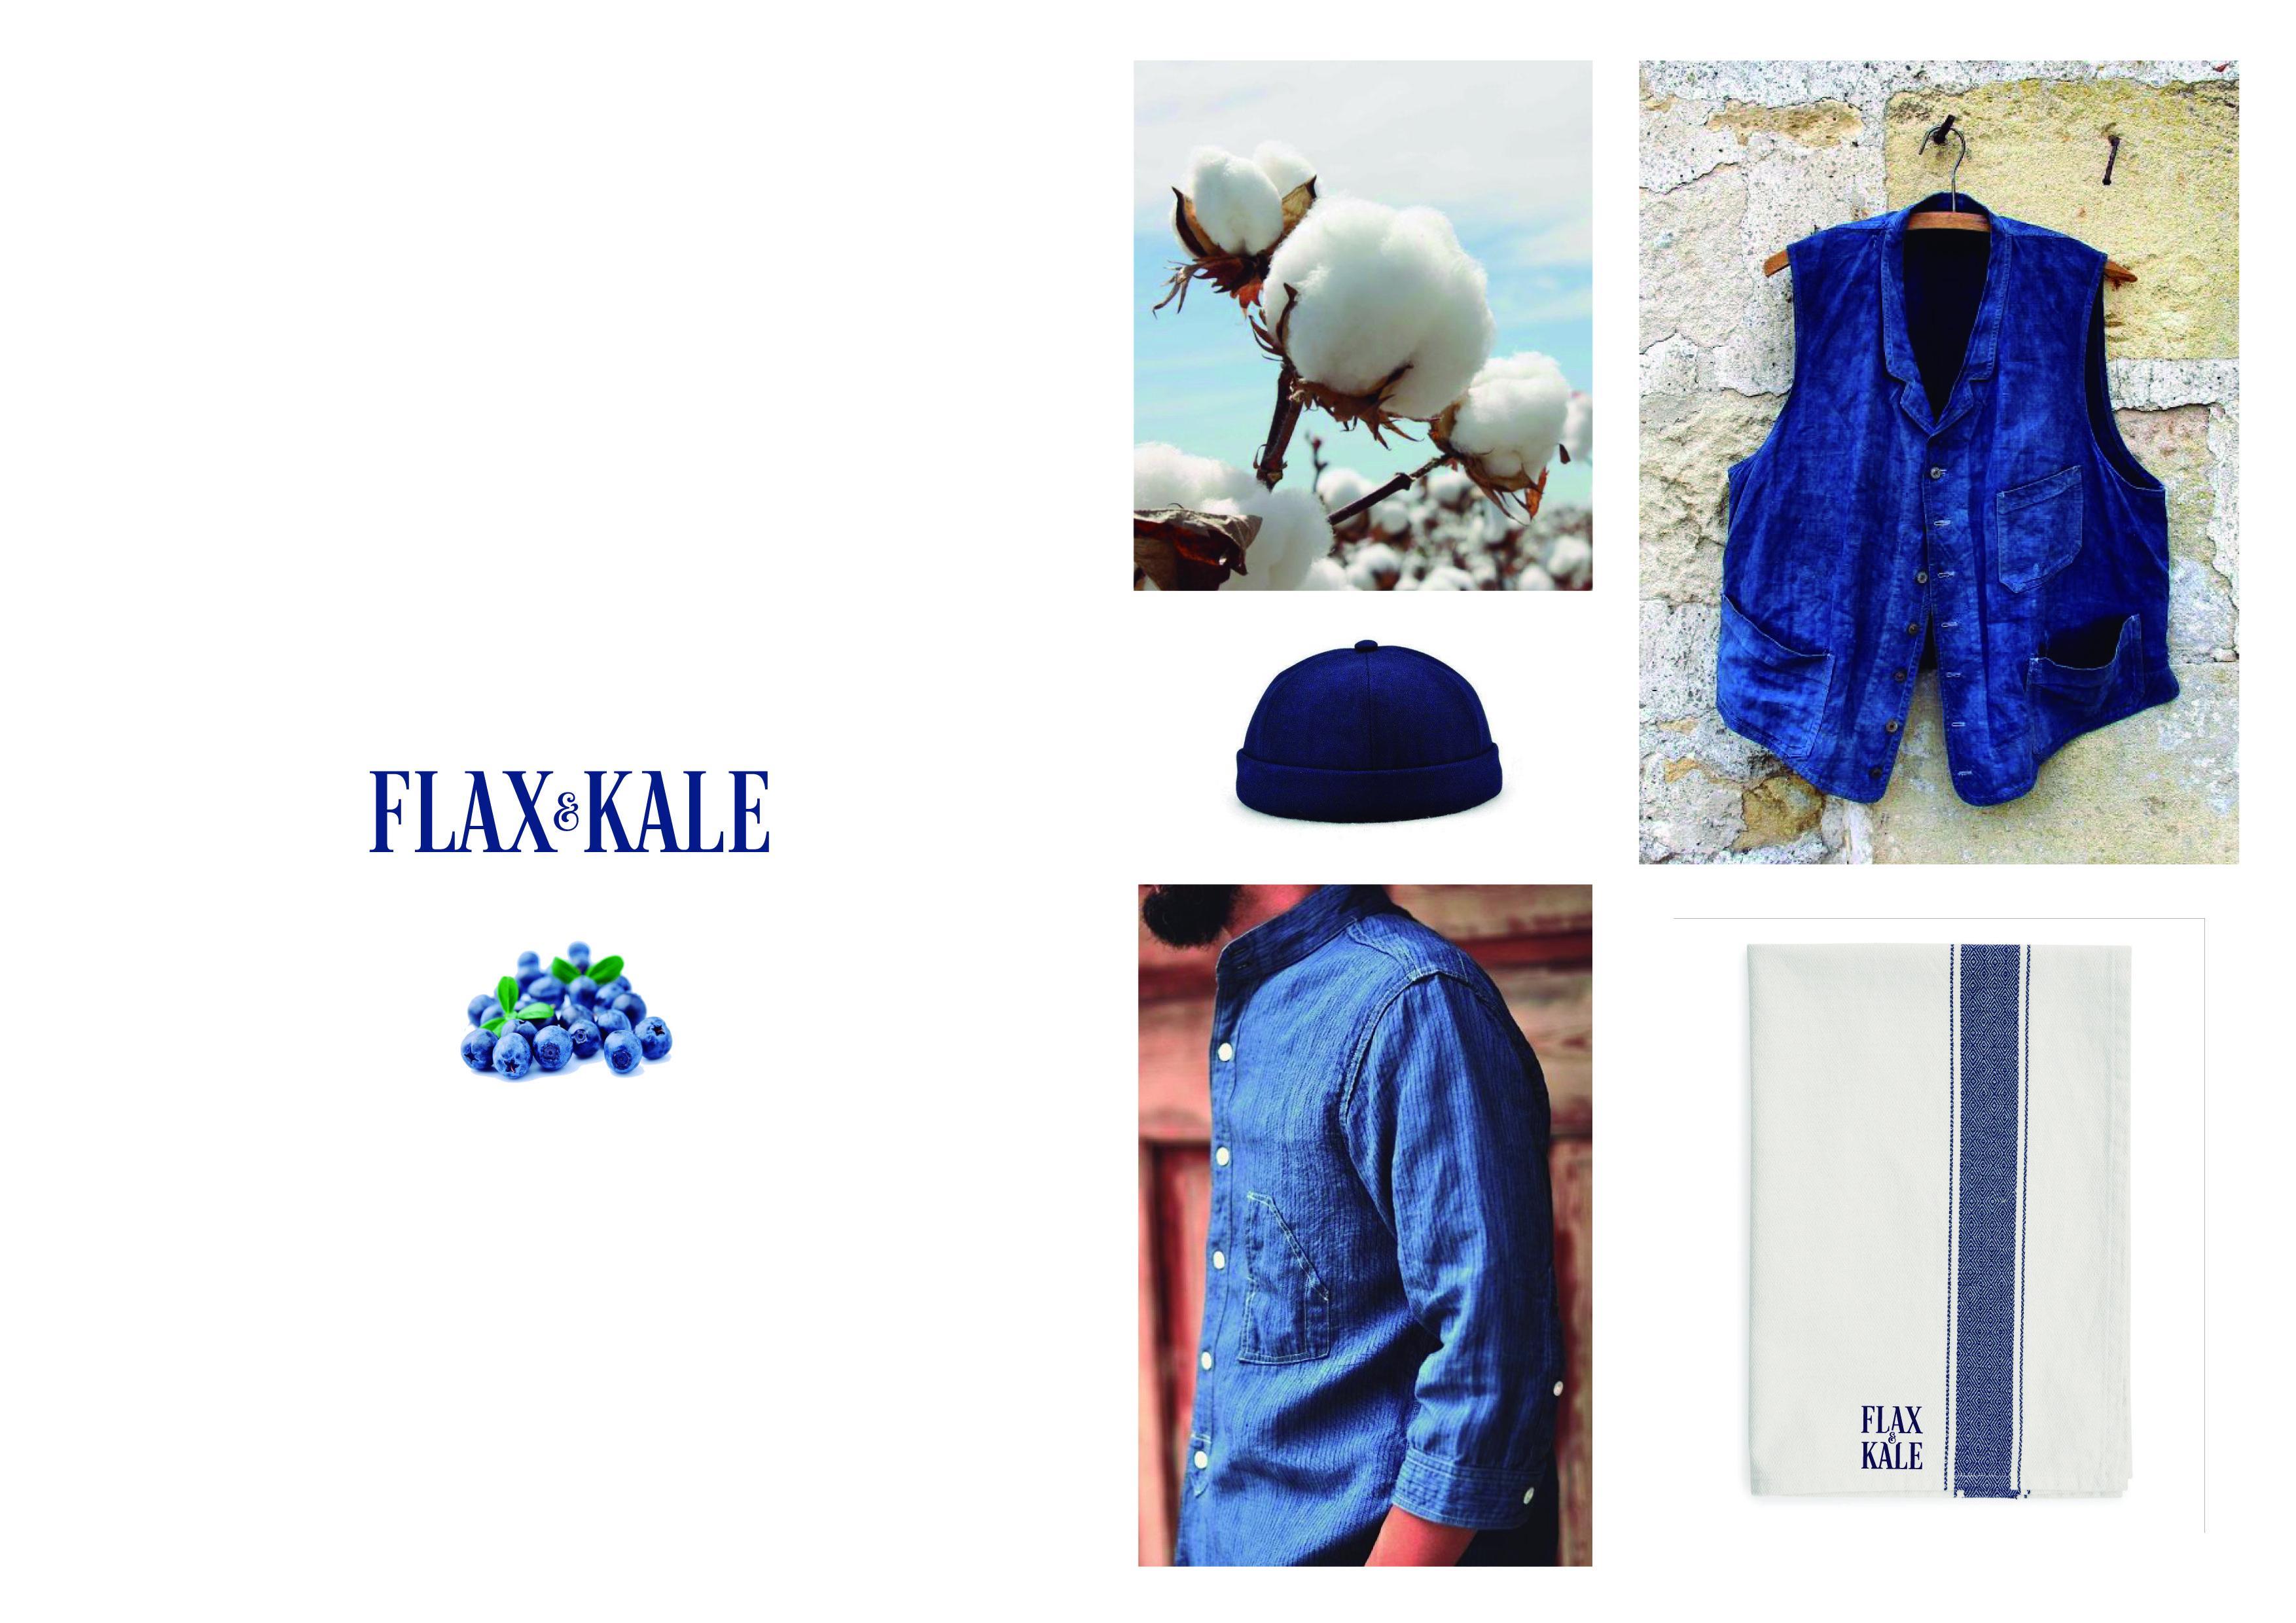 FLAX&KALE FINAL-08